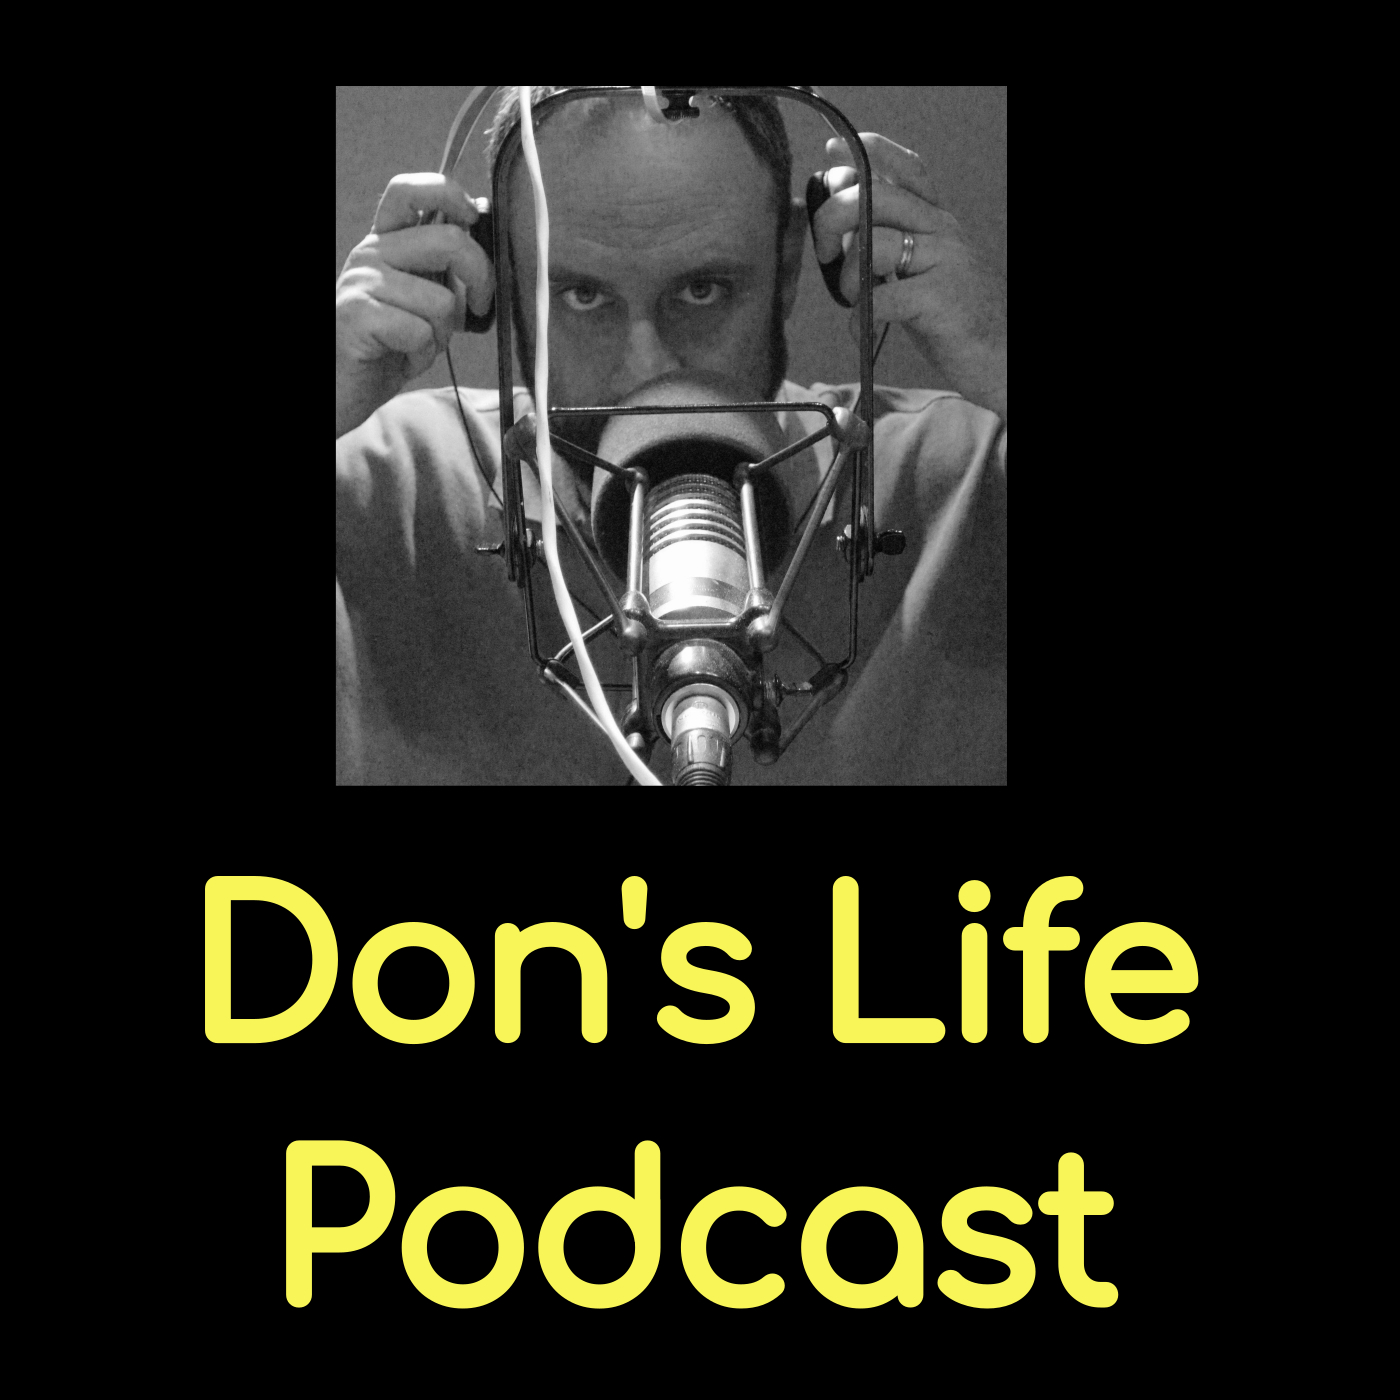 Artwork for Dons Life Podcast Episode 18